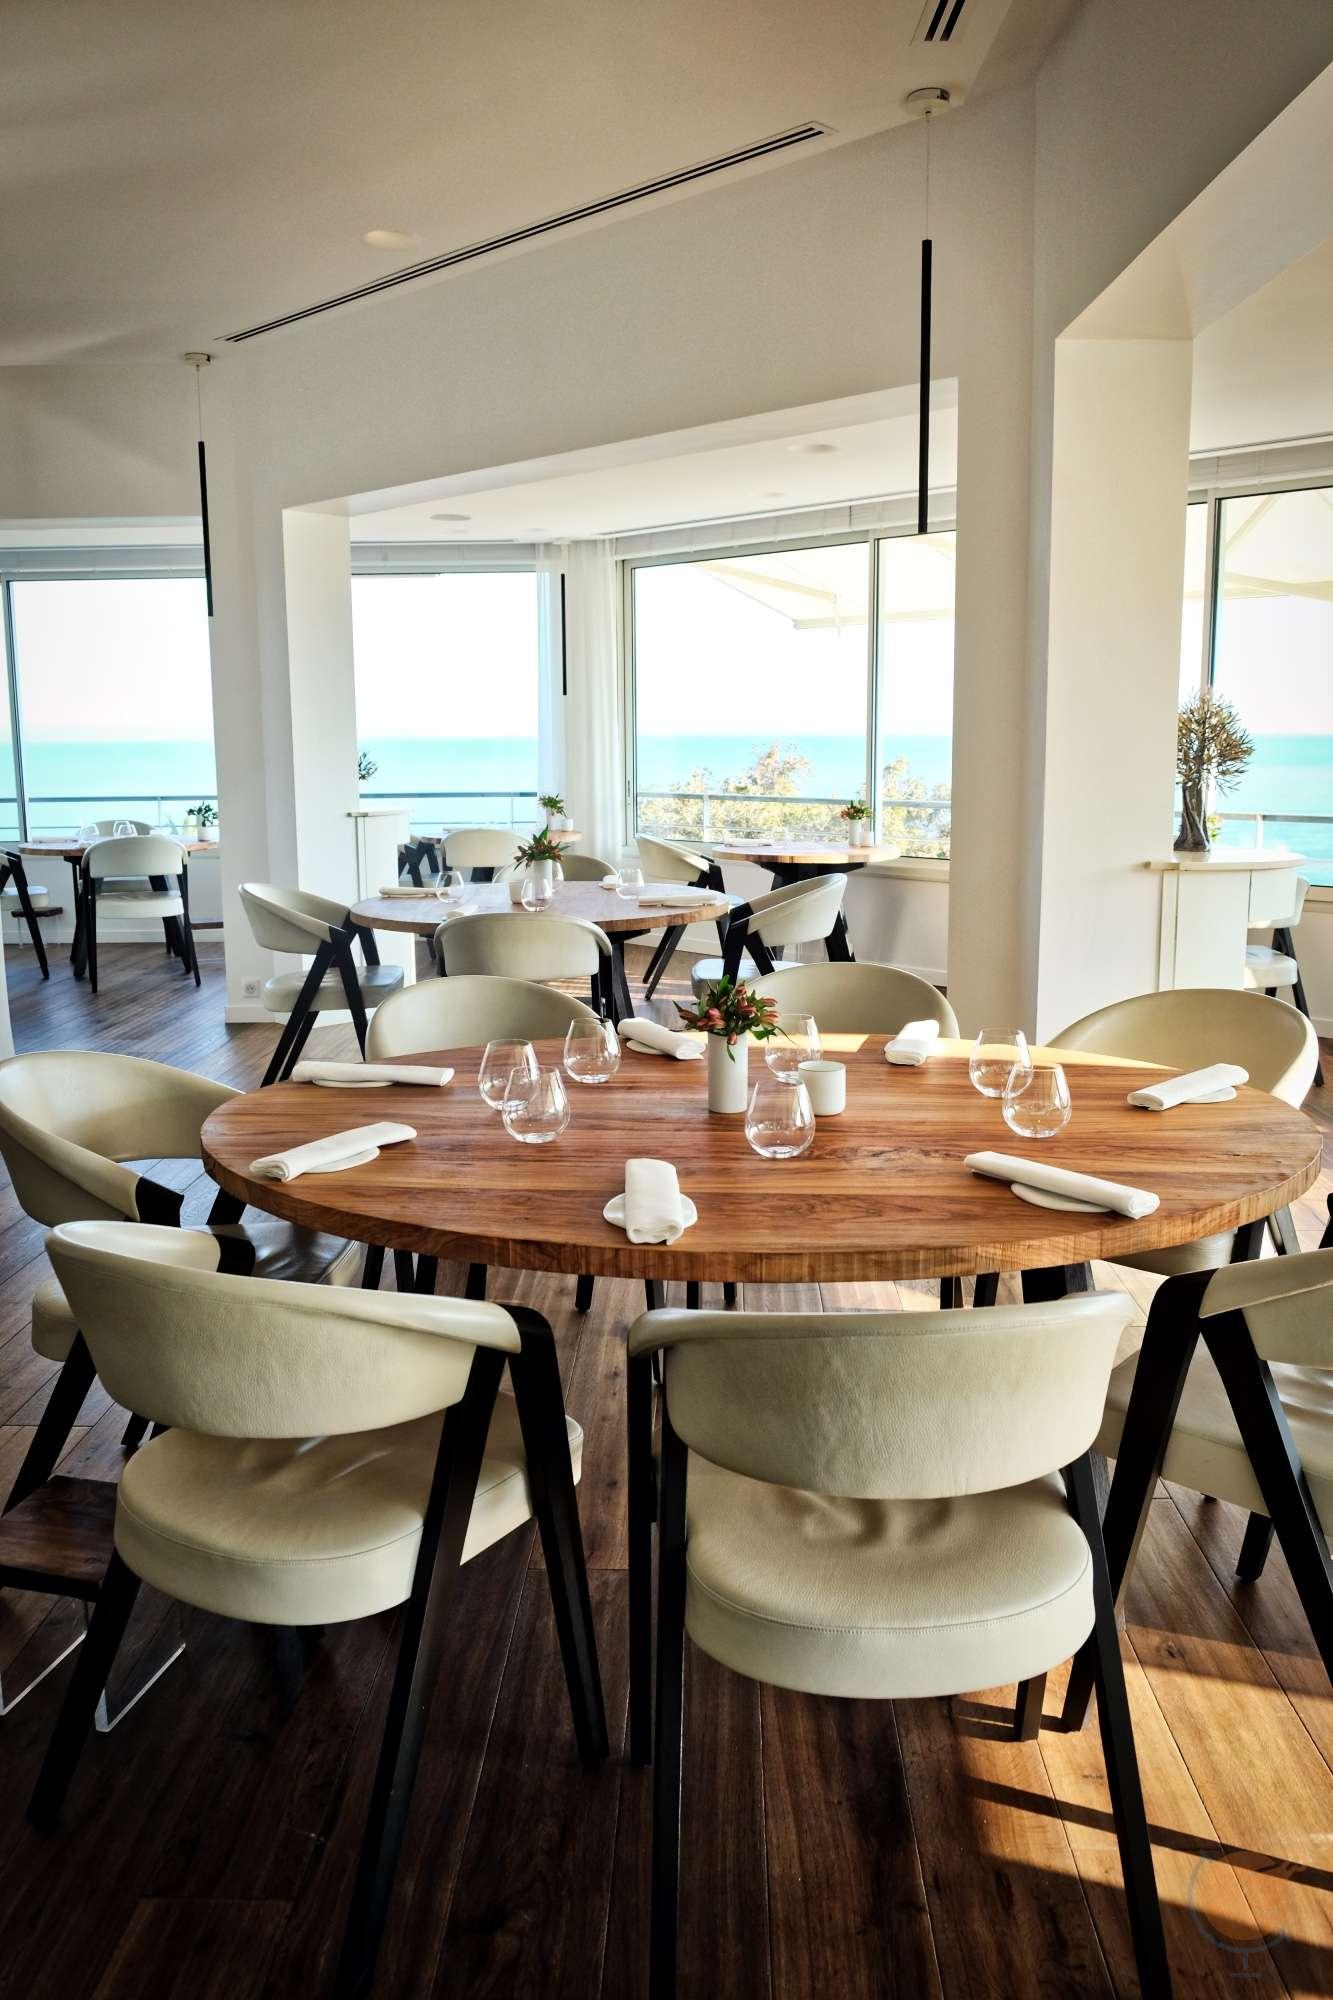 dscf1132_mirazur_menton_colagreco_restaurant_michelin_50best_vilagevo_jokuti_andras_l_w.jpg